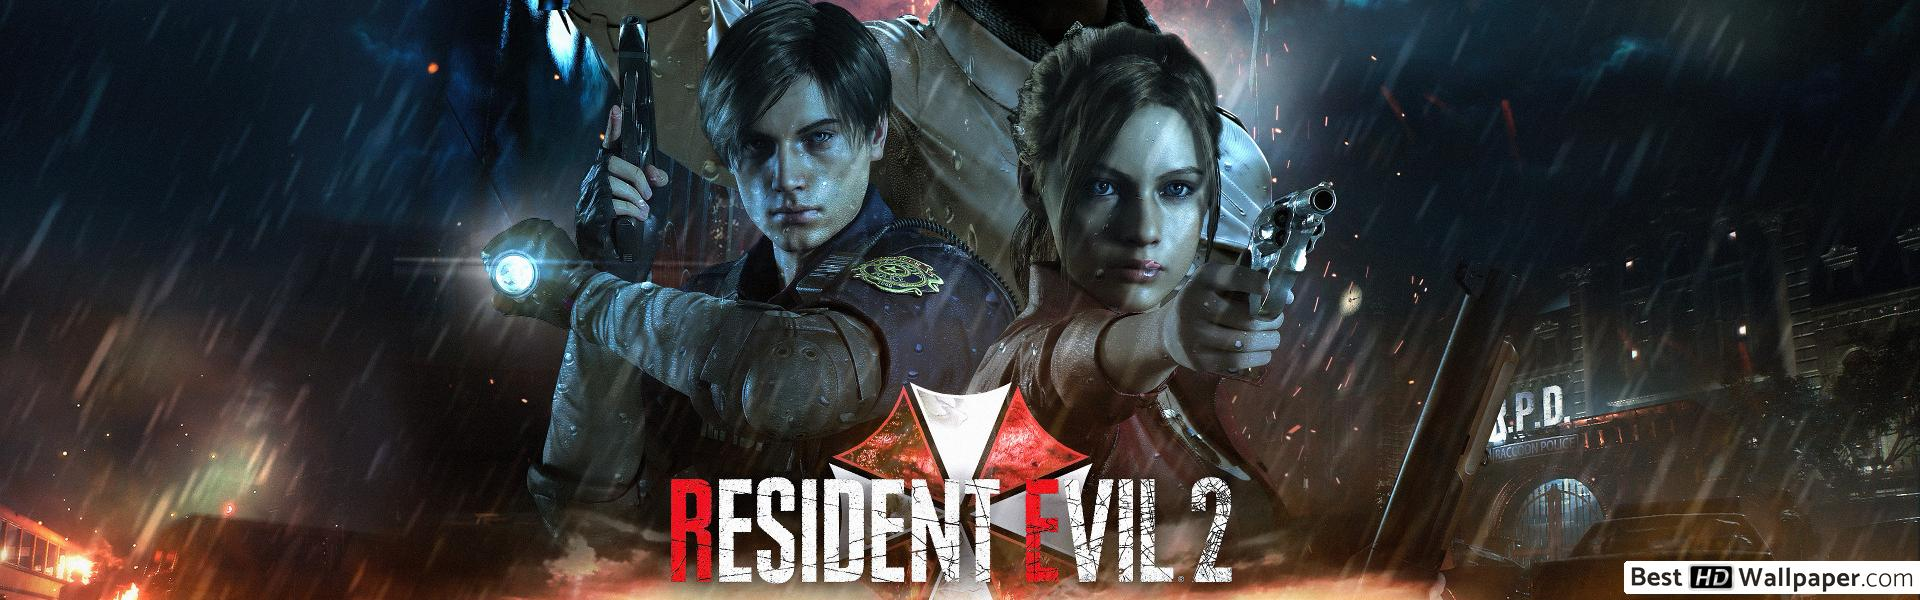 Resident Evil 2 Remake Wallpaper 4k Posted By Samantha Thompson